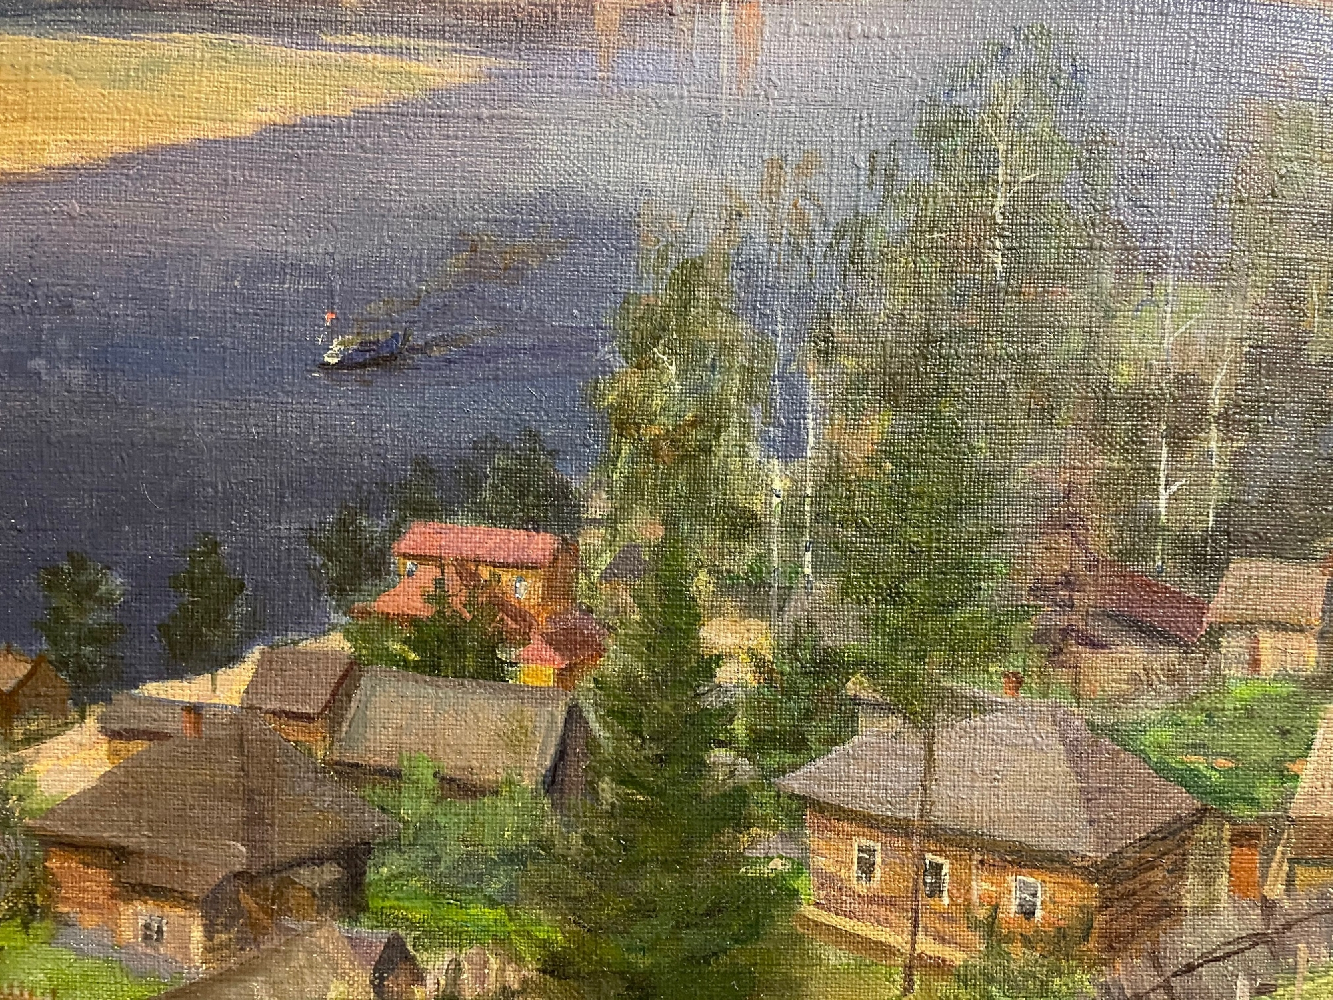 Кибардин Георгий Владимирович. Любуются видом